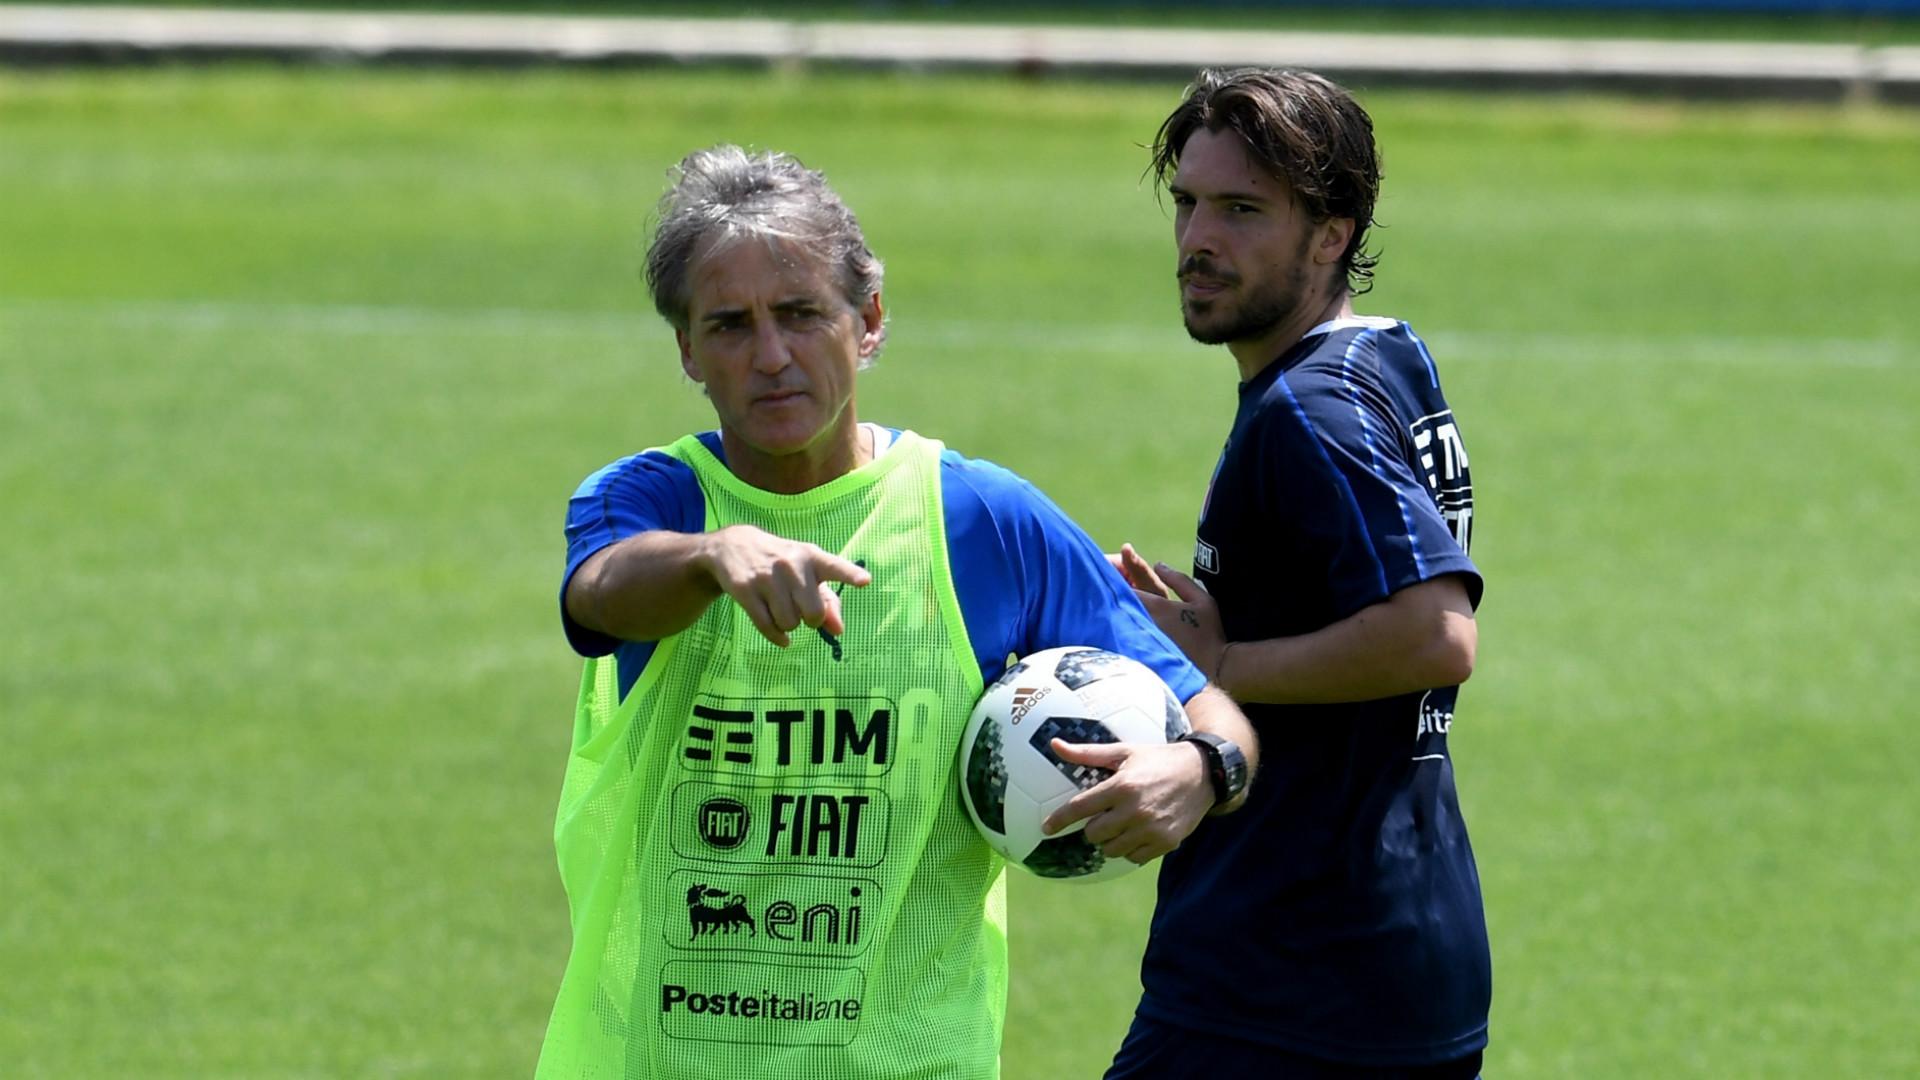 Roberto Mancini Simone Verdi Italy 24052018